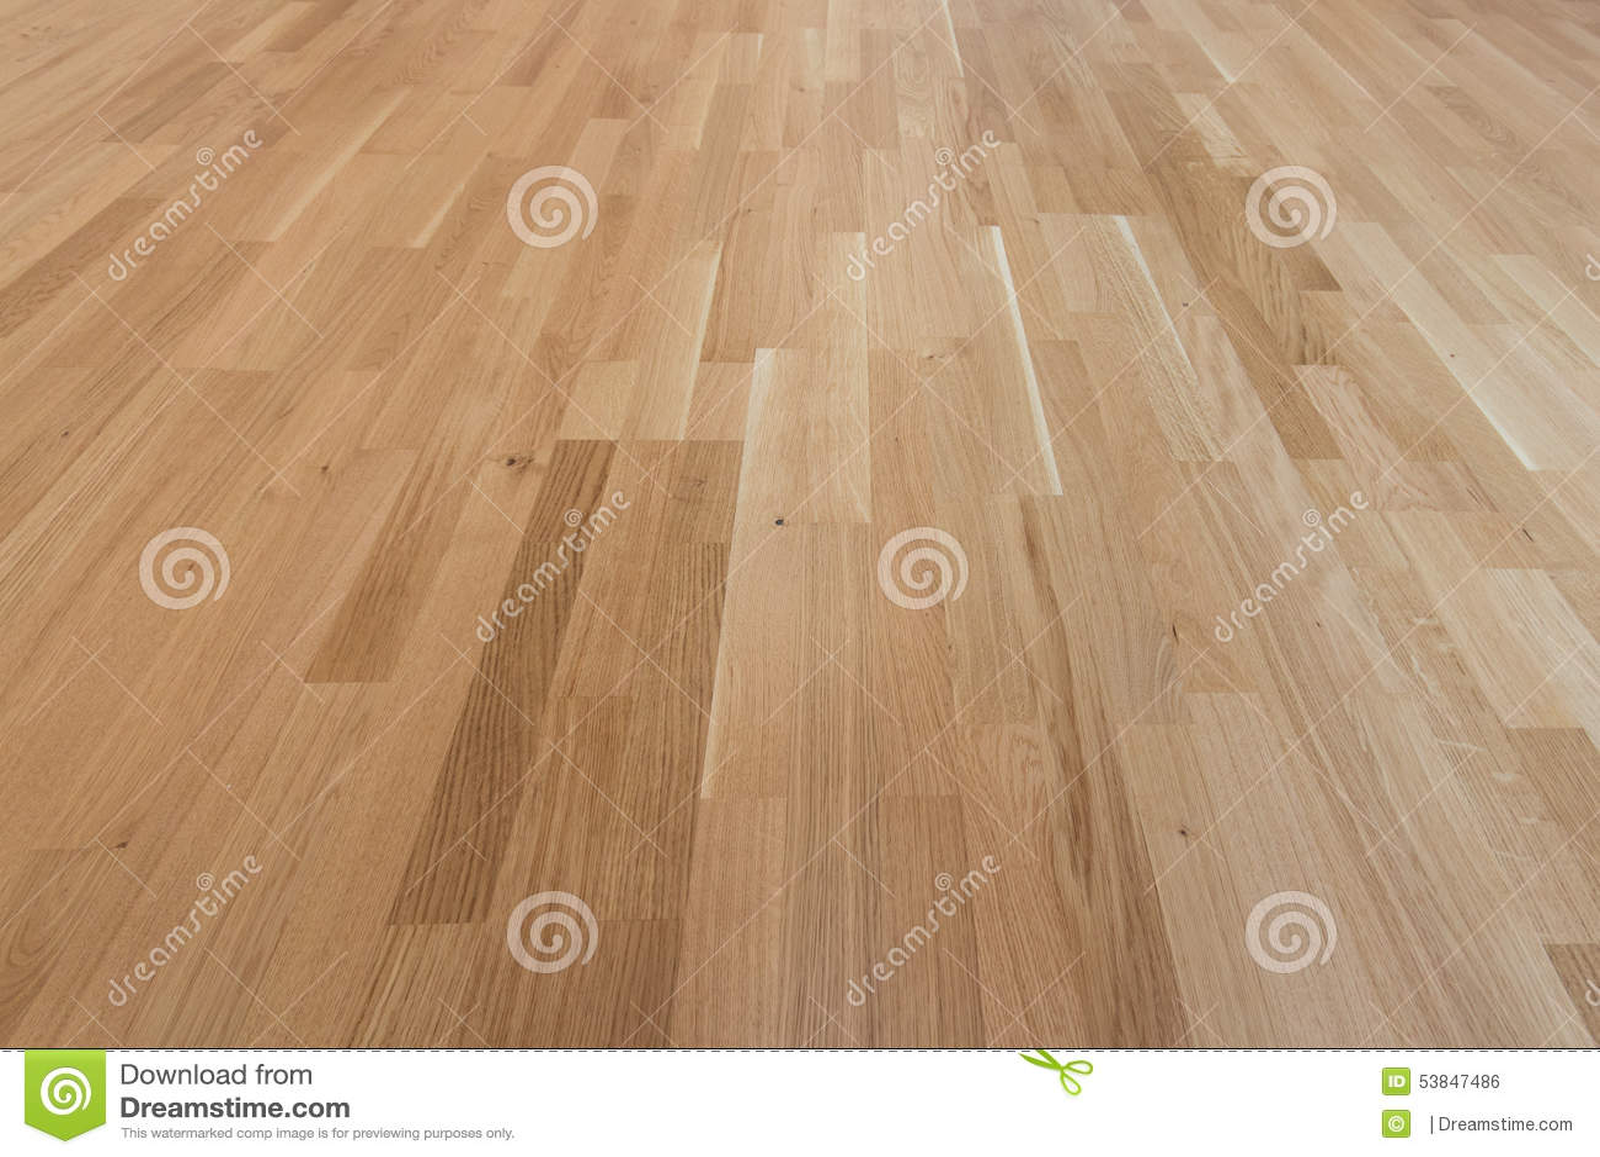 Wood floor - oak parquet / laminat